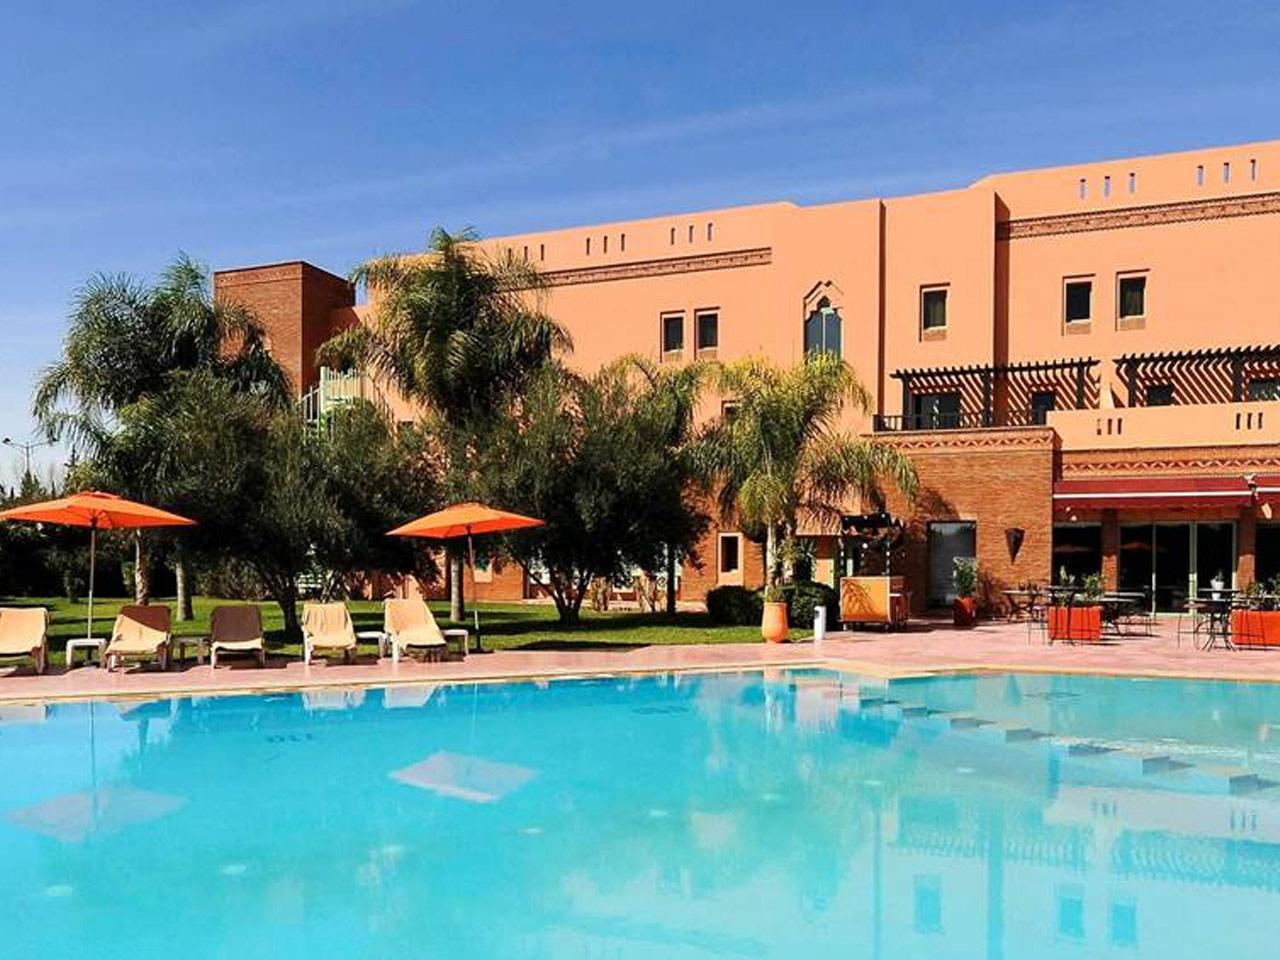 IBIS La Palmeraie Marrakech - Sahara Tour Maroc 2018 Bumperoffroad